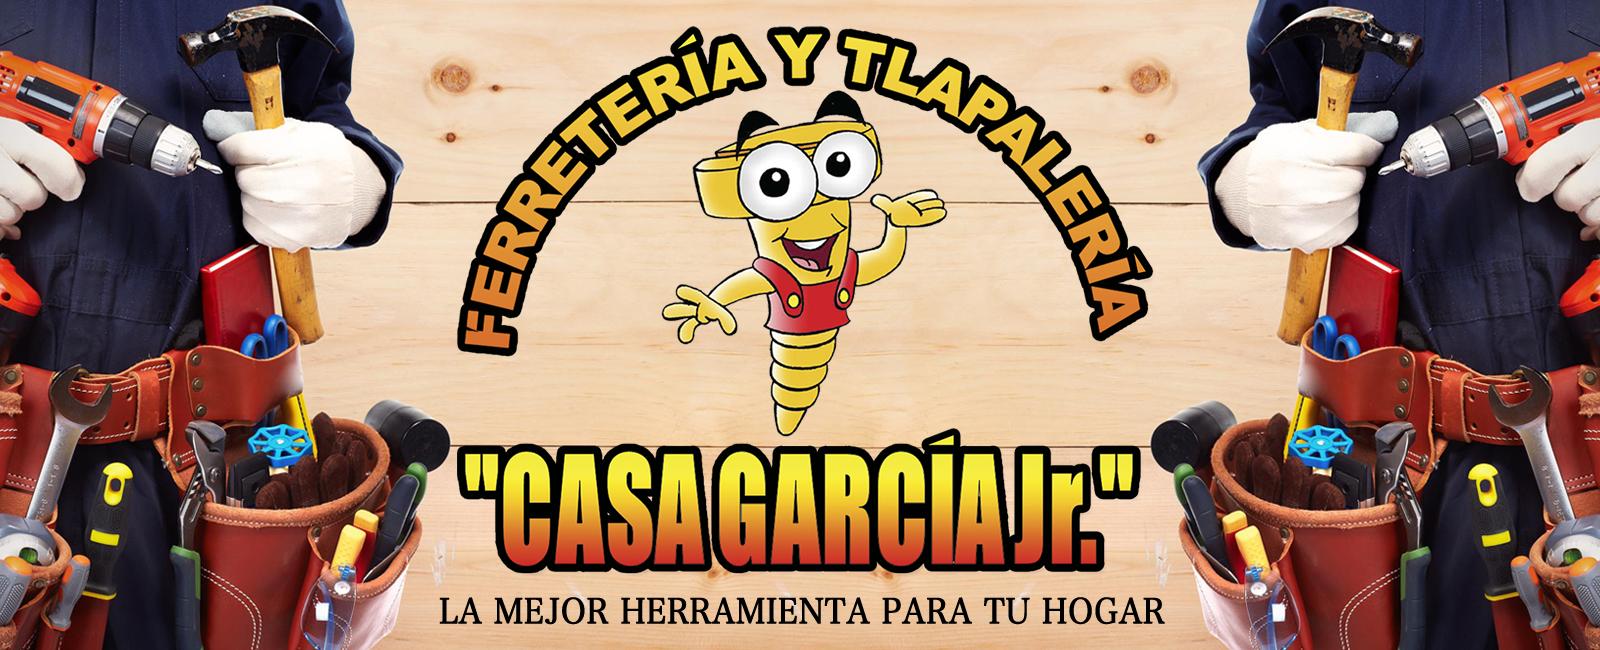 tlapaleria-ferreteria-casa-garcia-jr-almanaque-mx